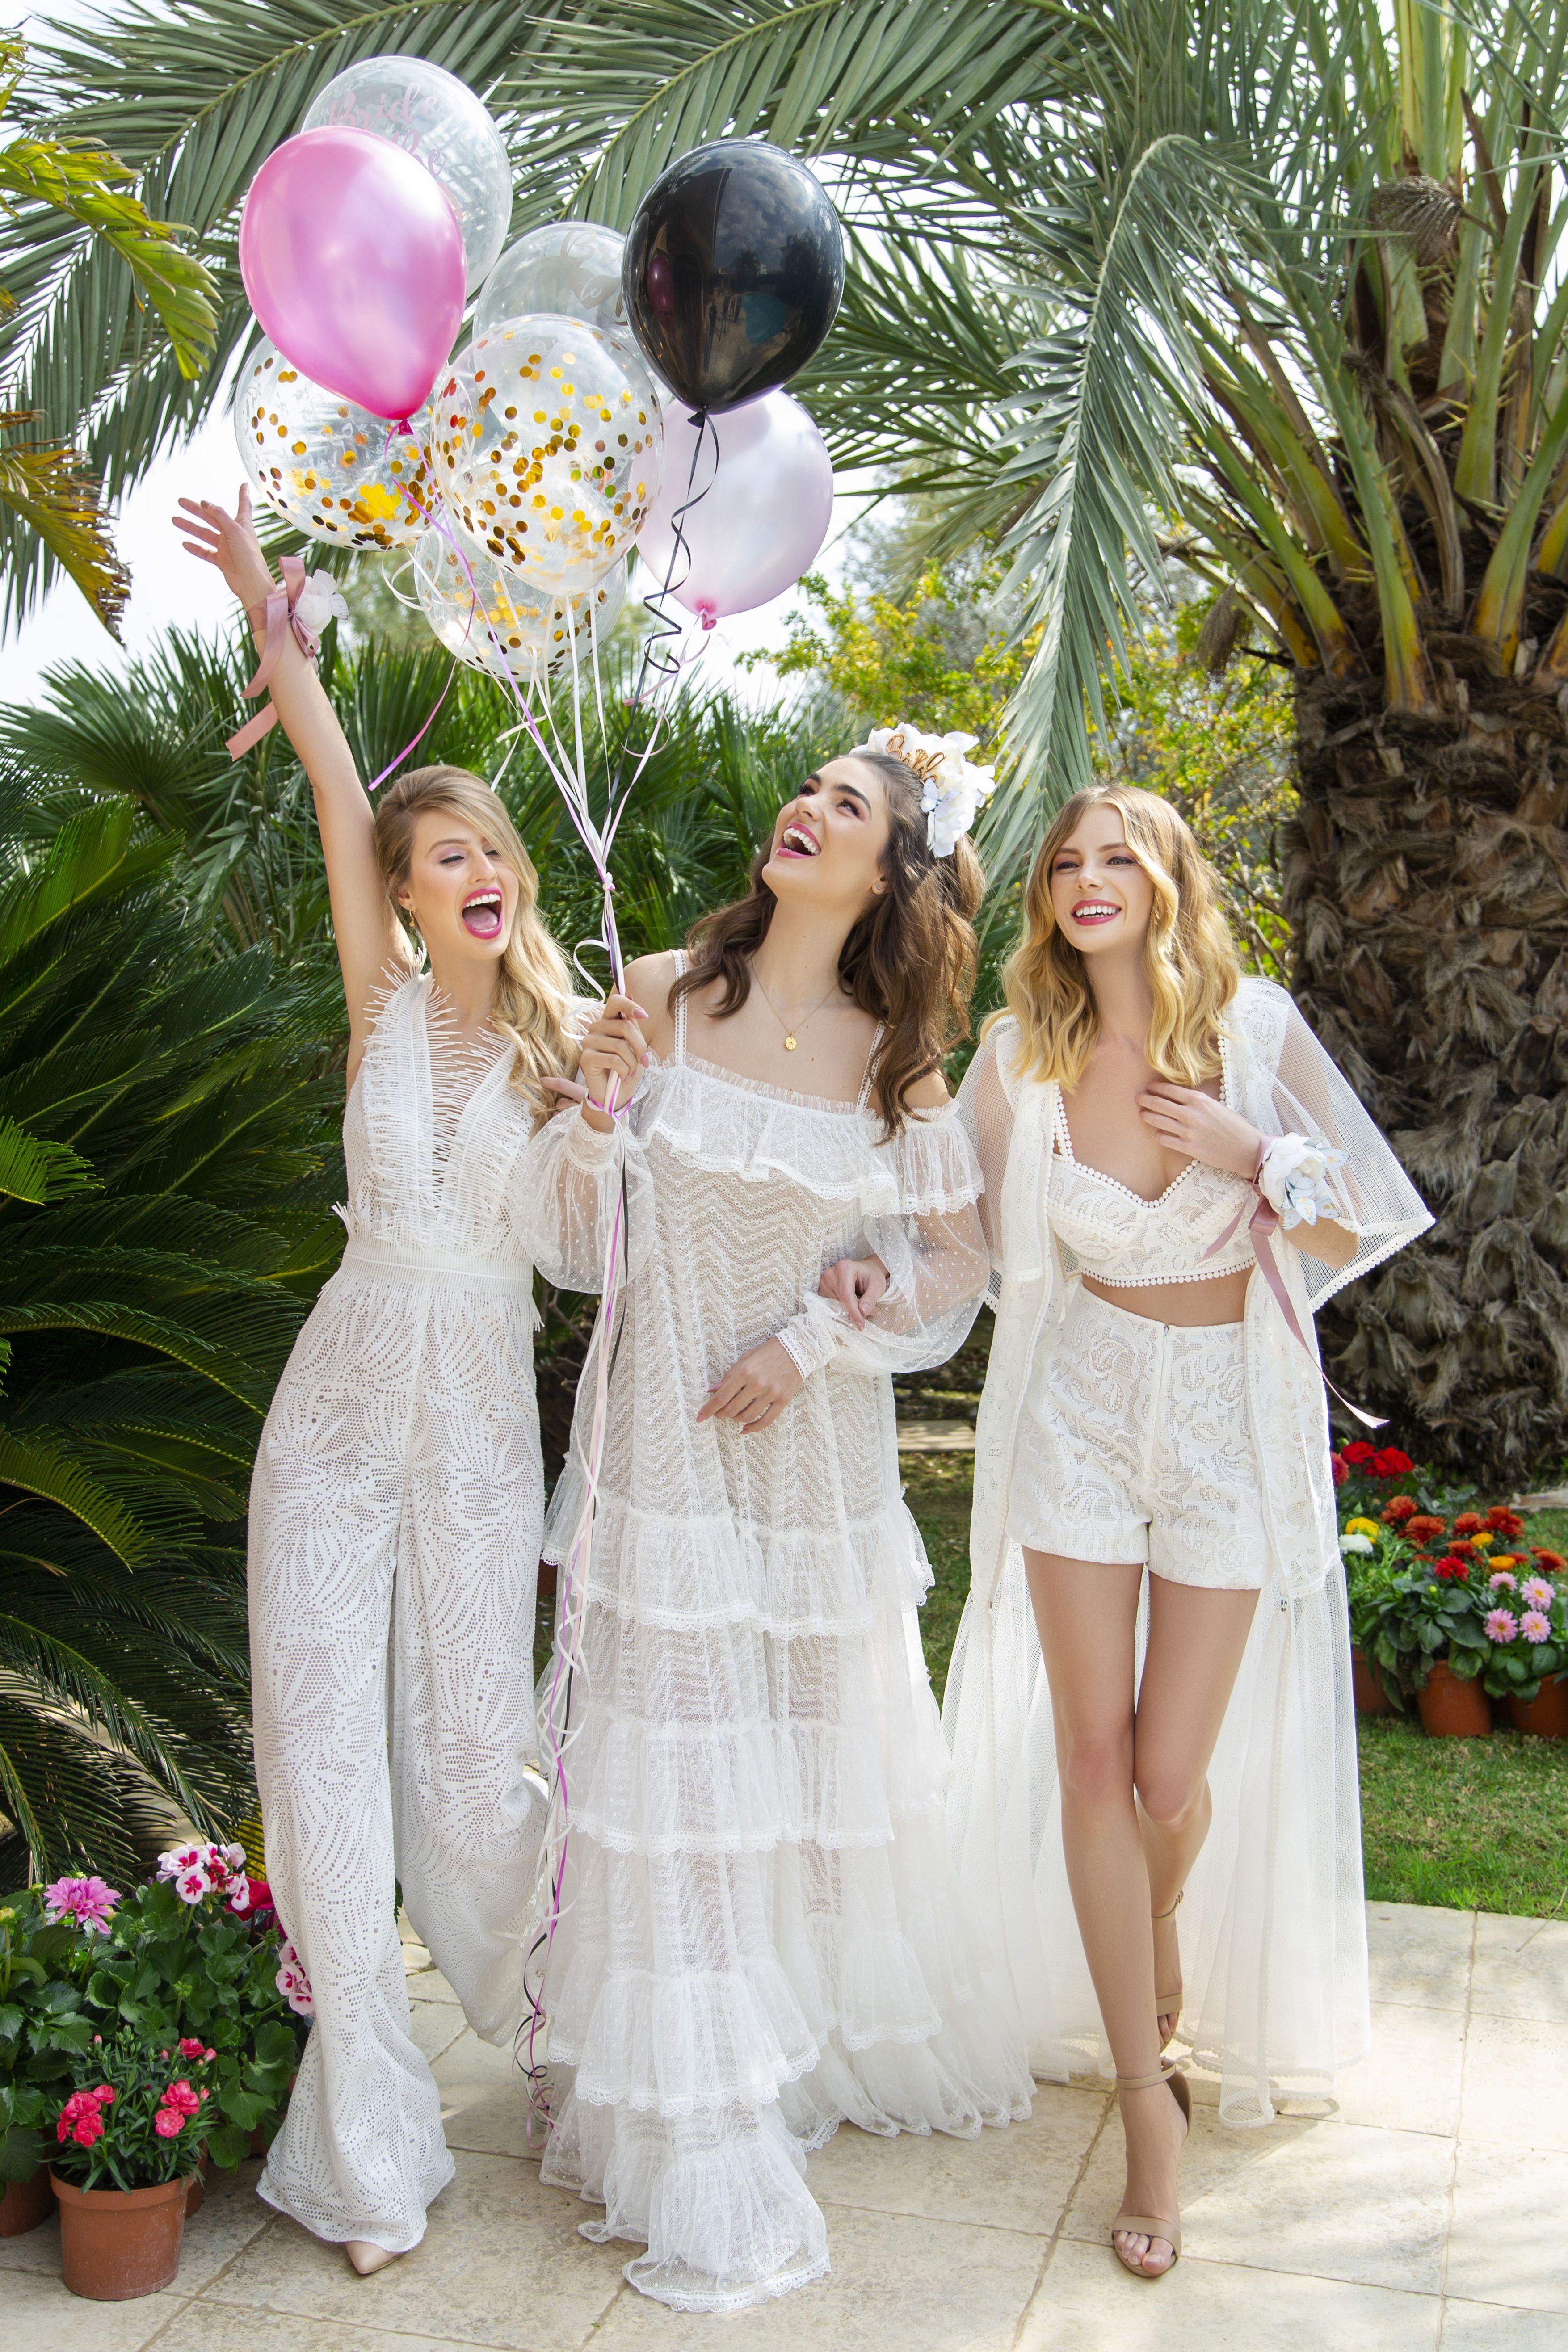 Bachelorette Party Bachelorette Outfit Bachelorette Photography Bachelorette Moments Bridal Hen Party Dress Bridal Party Dresses Bachelorette Dress